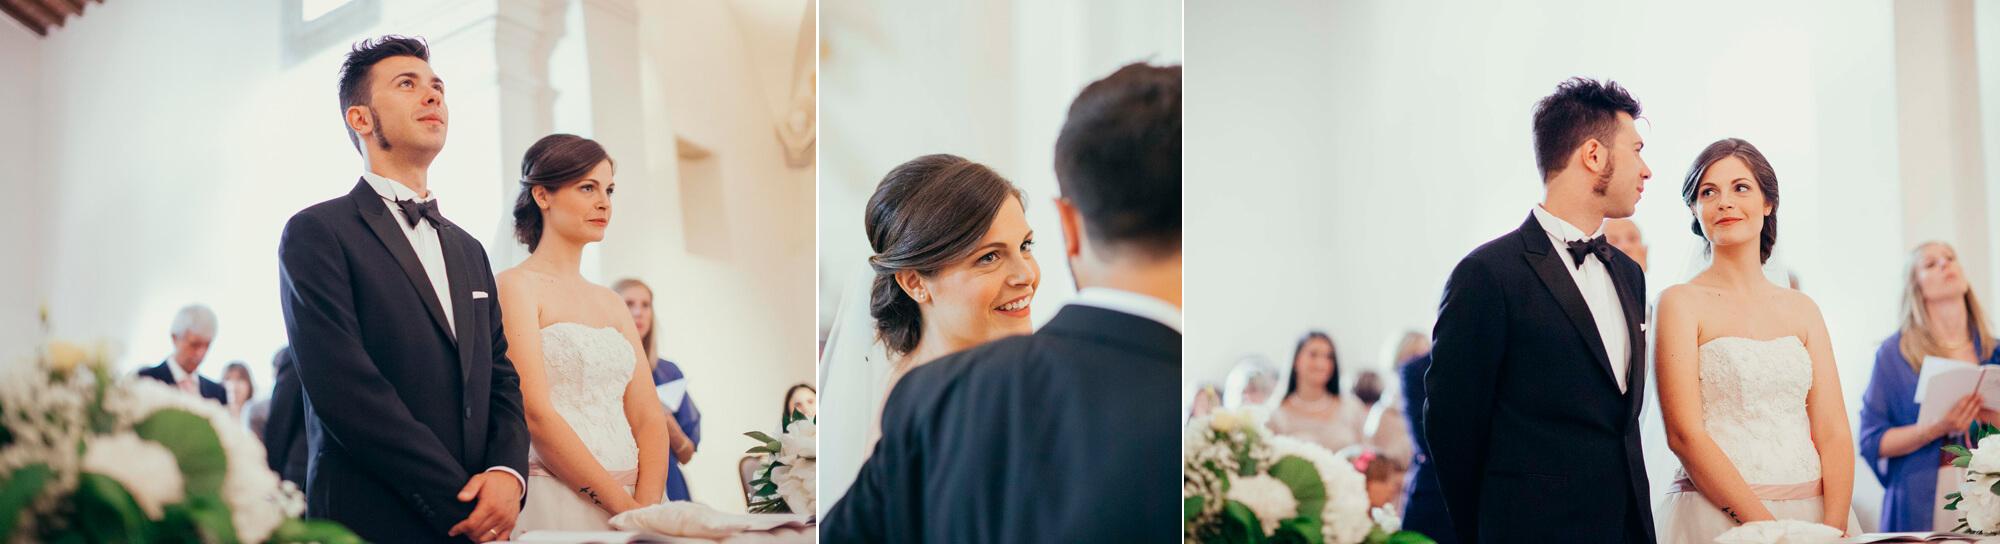 066-arezzo-wedding-photographer.jpg